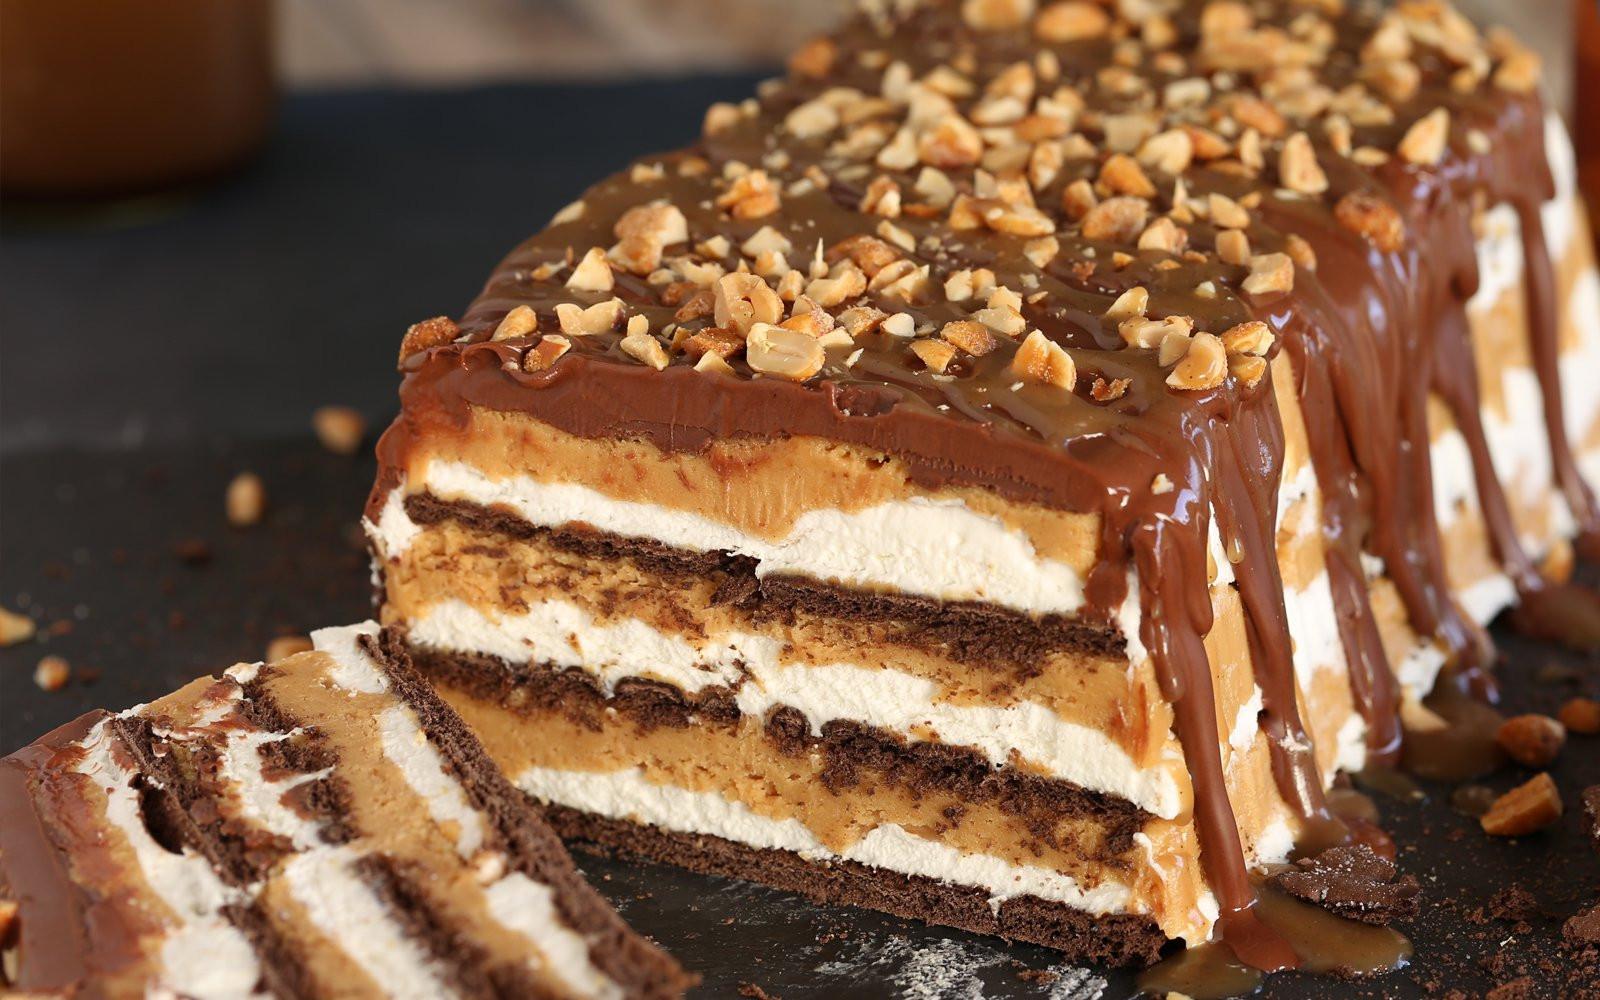 Best Peanut Butter Desserts  21 Delicious Peanut Butter Dessert Recipes joyenergizer